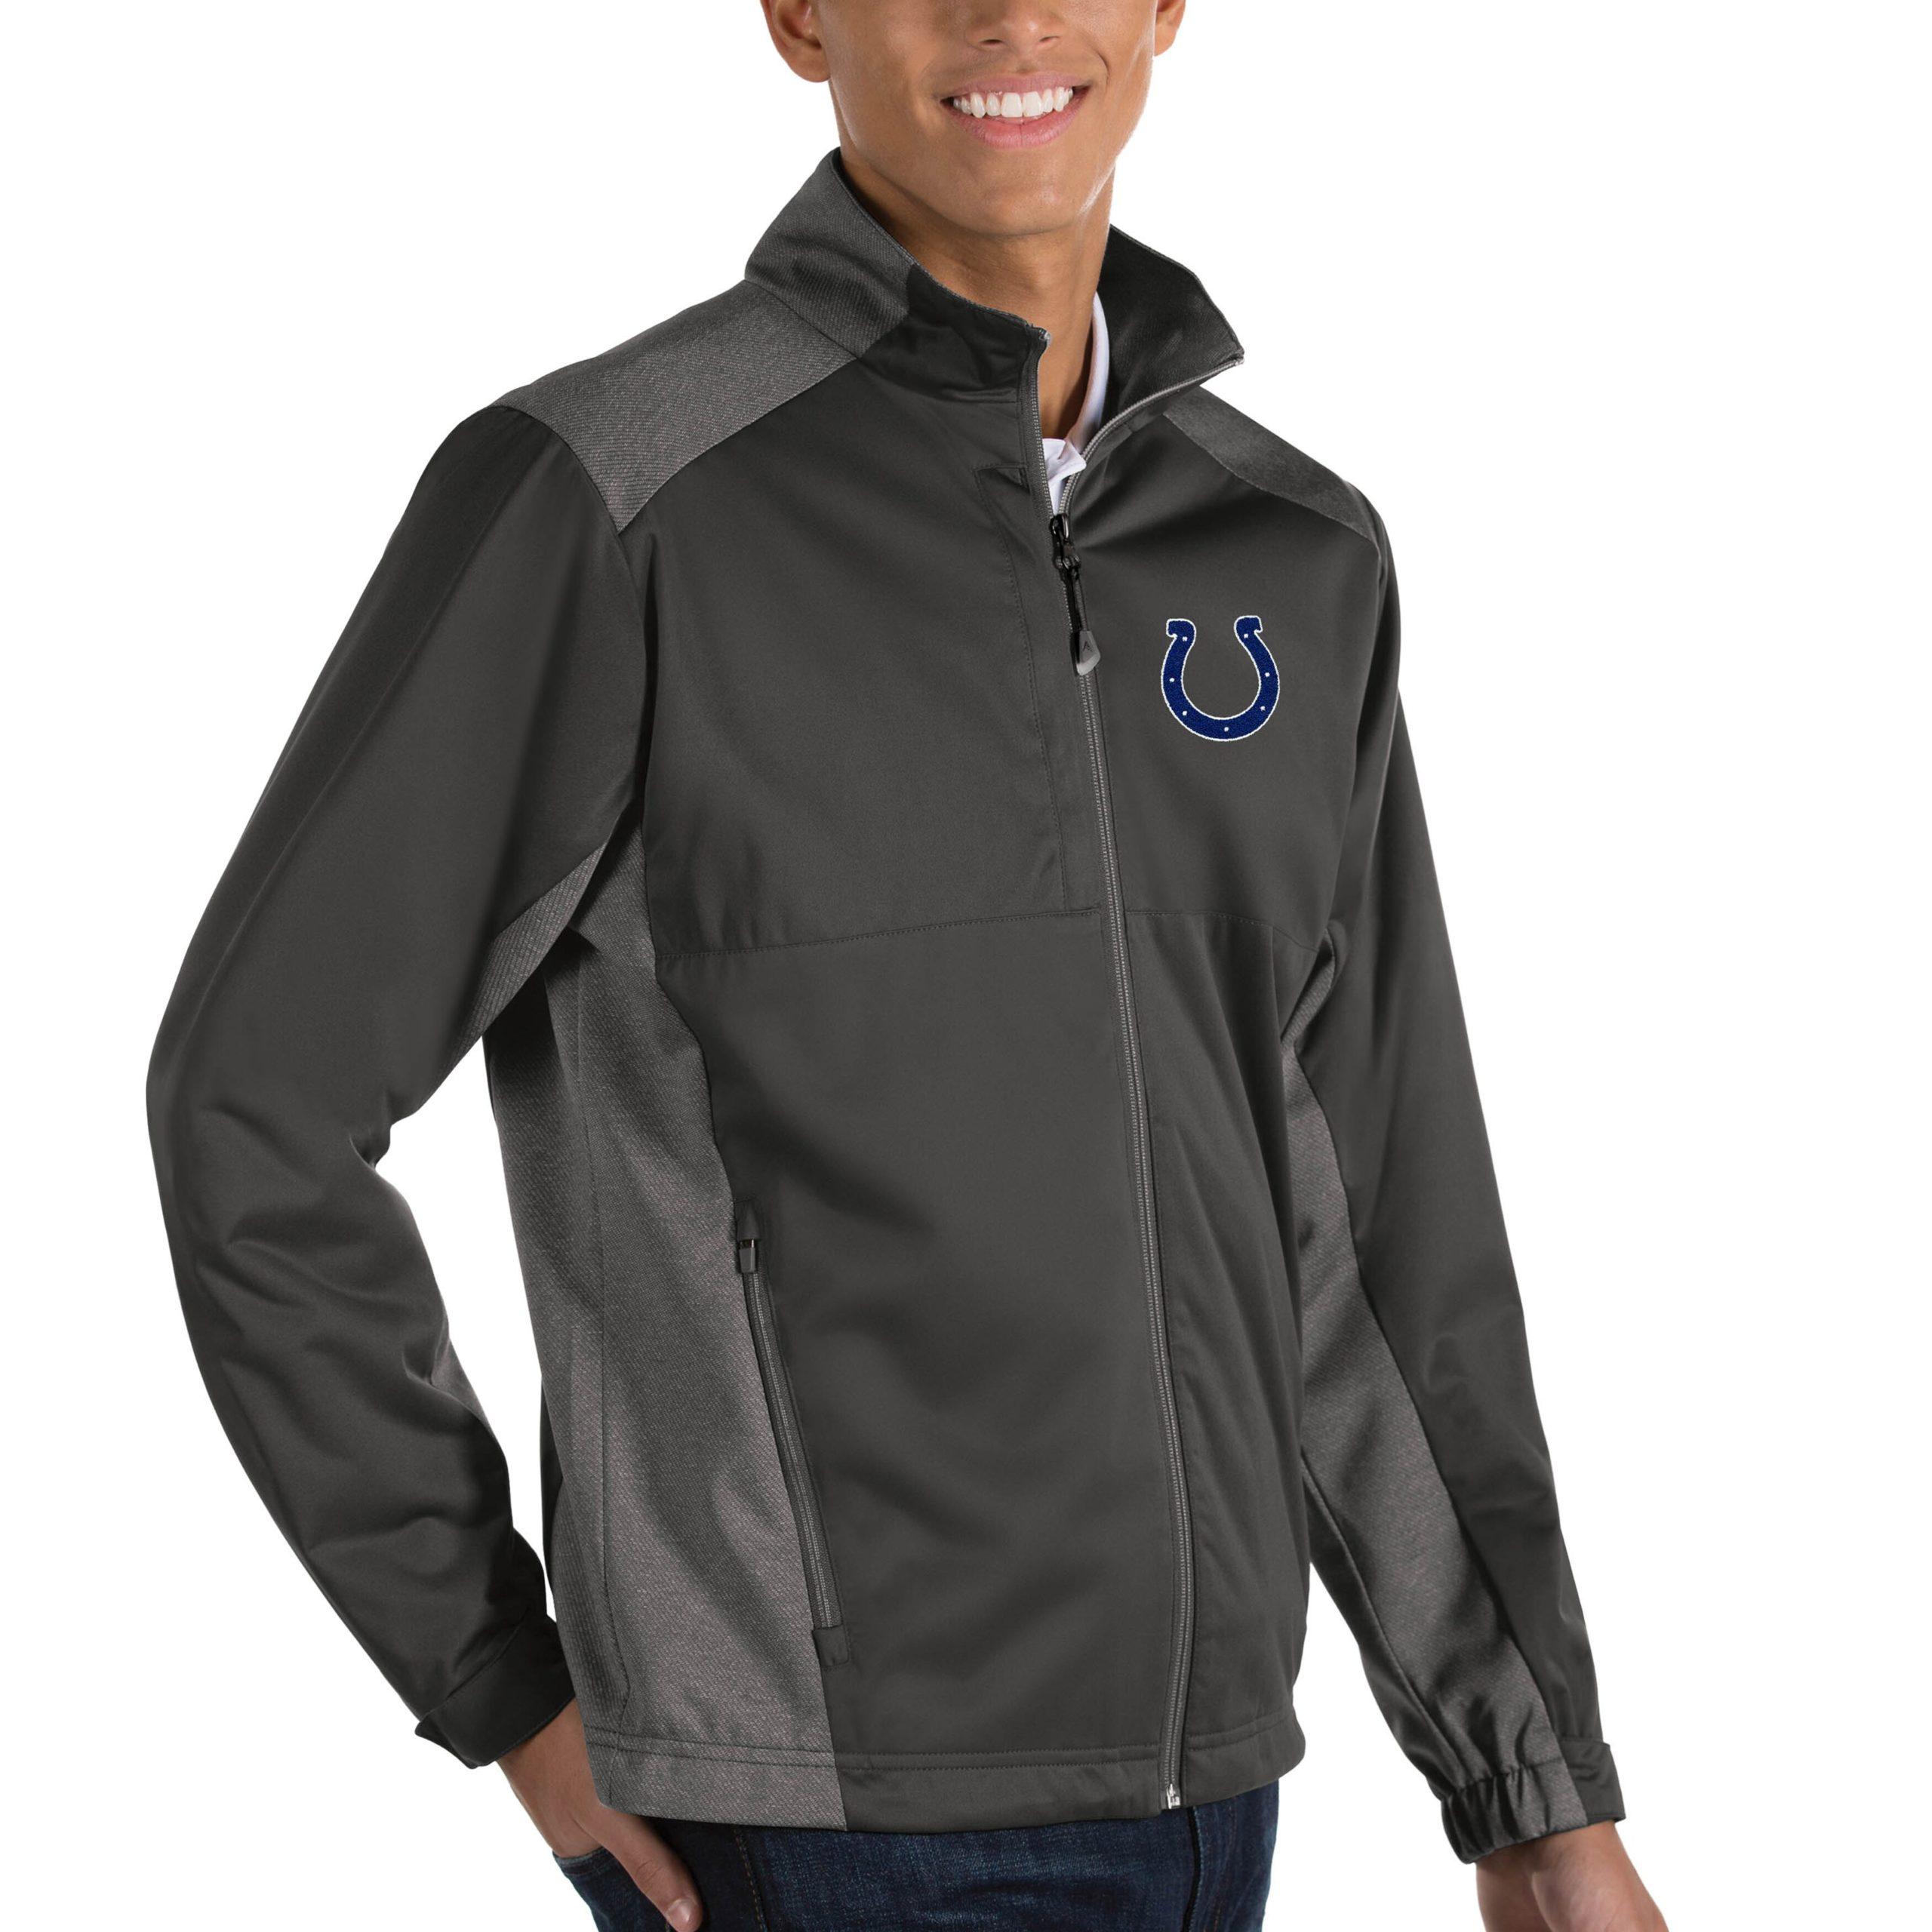 Indianapolis Colts Antigua Revolve Big & Tall Full-Zip Jacket - Heather Charcoal